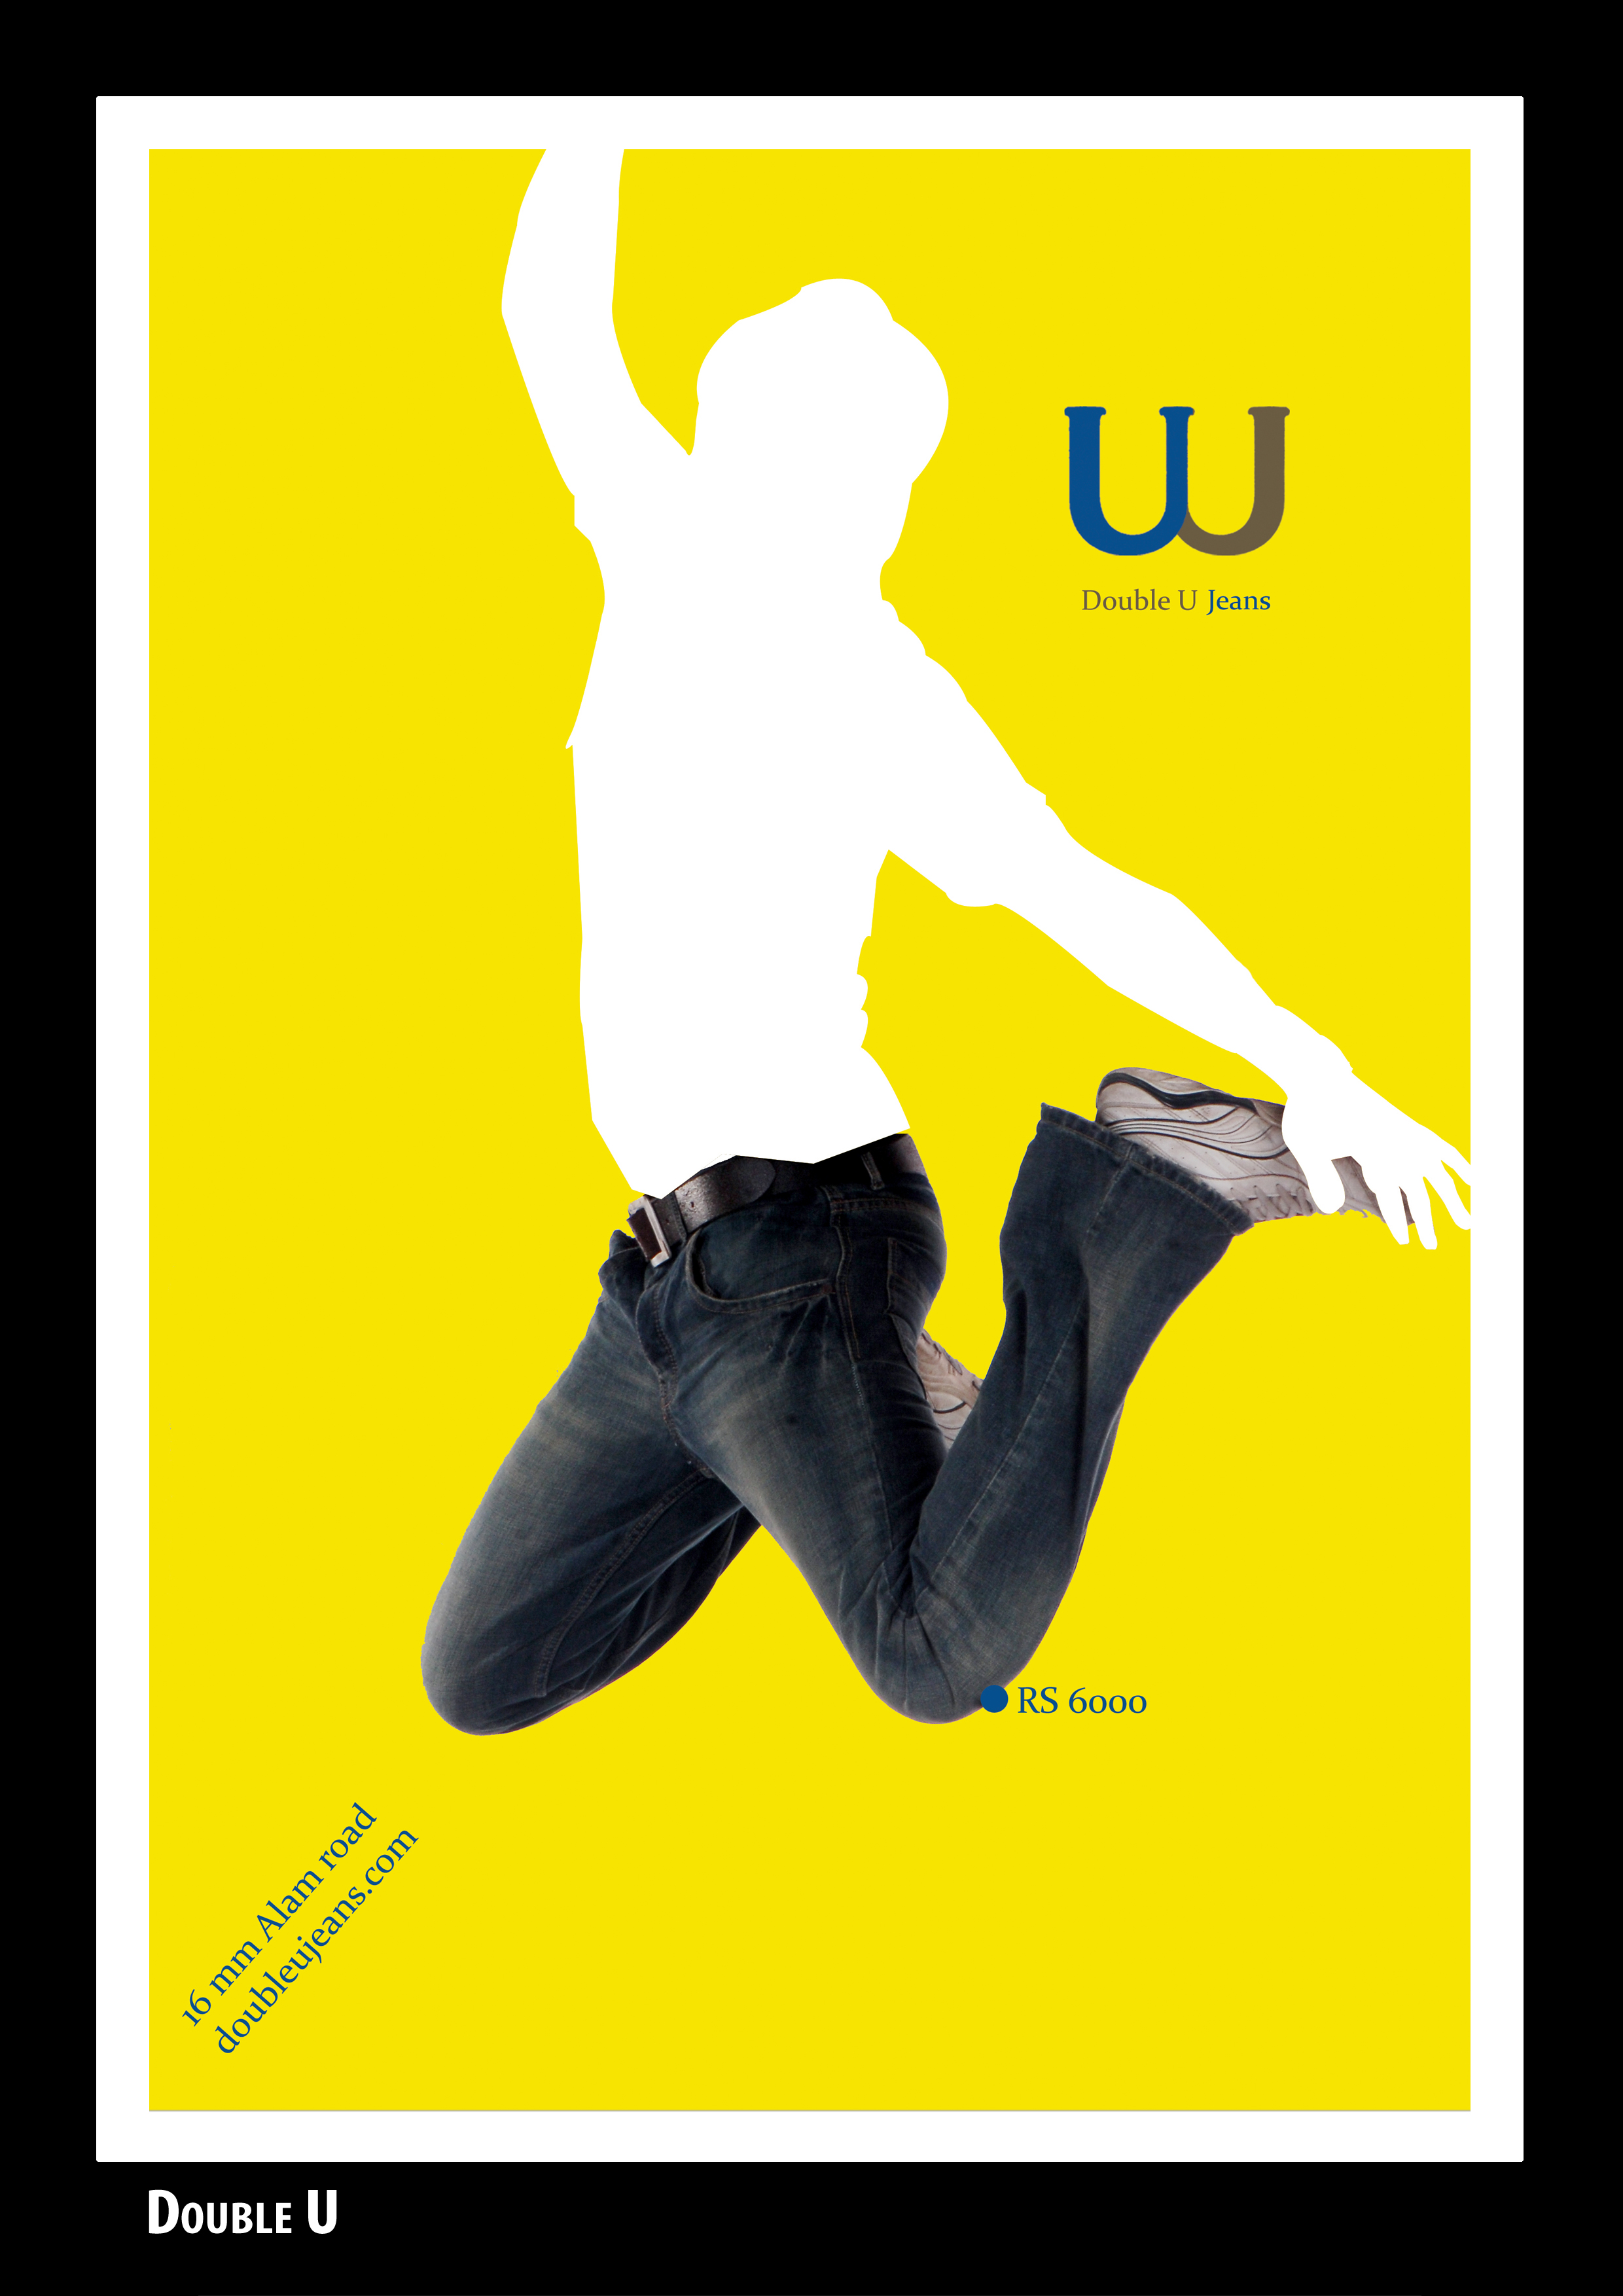 Poster design jeans - Double U Jeans Magazine Print 2